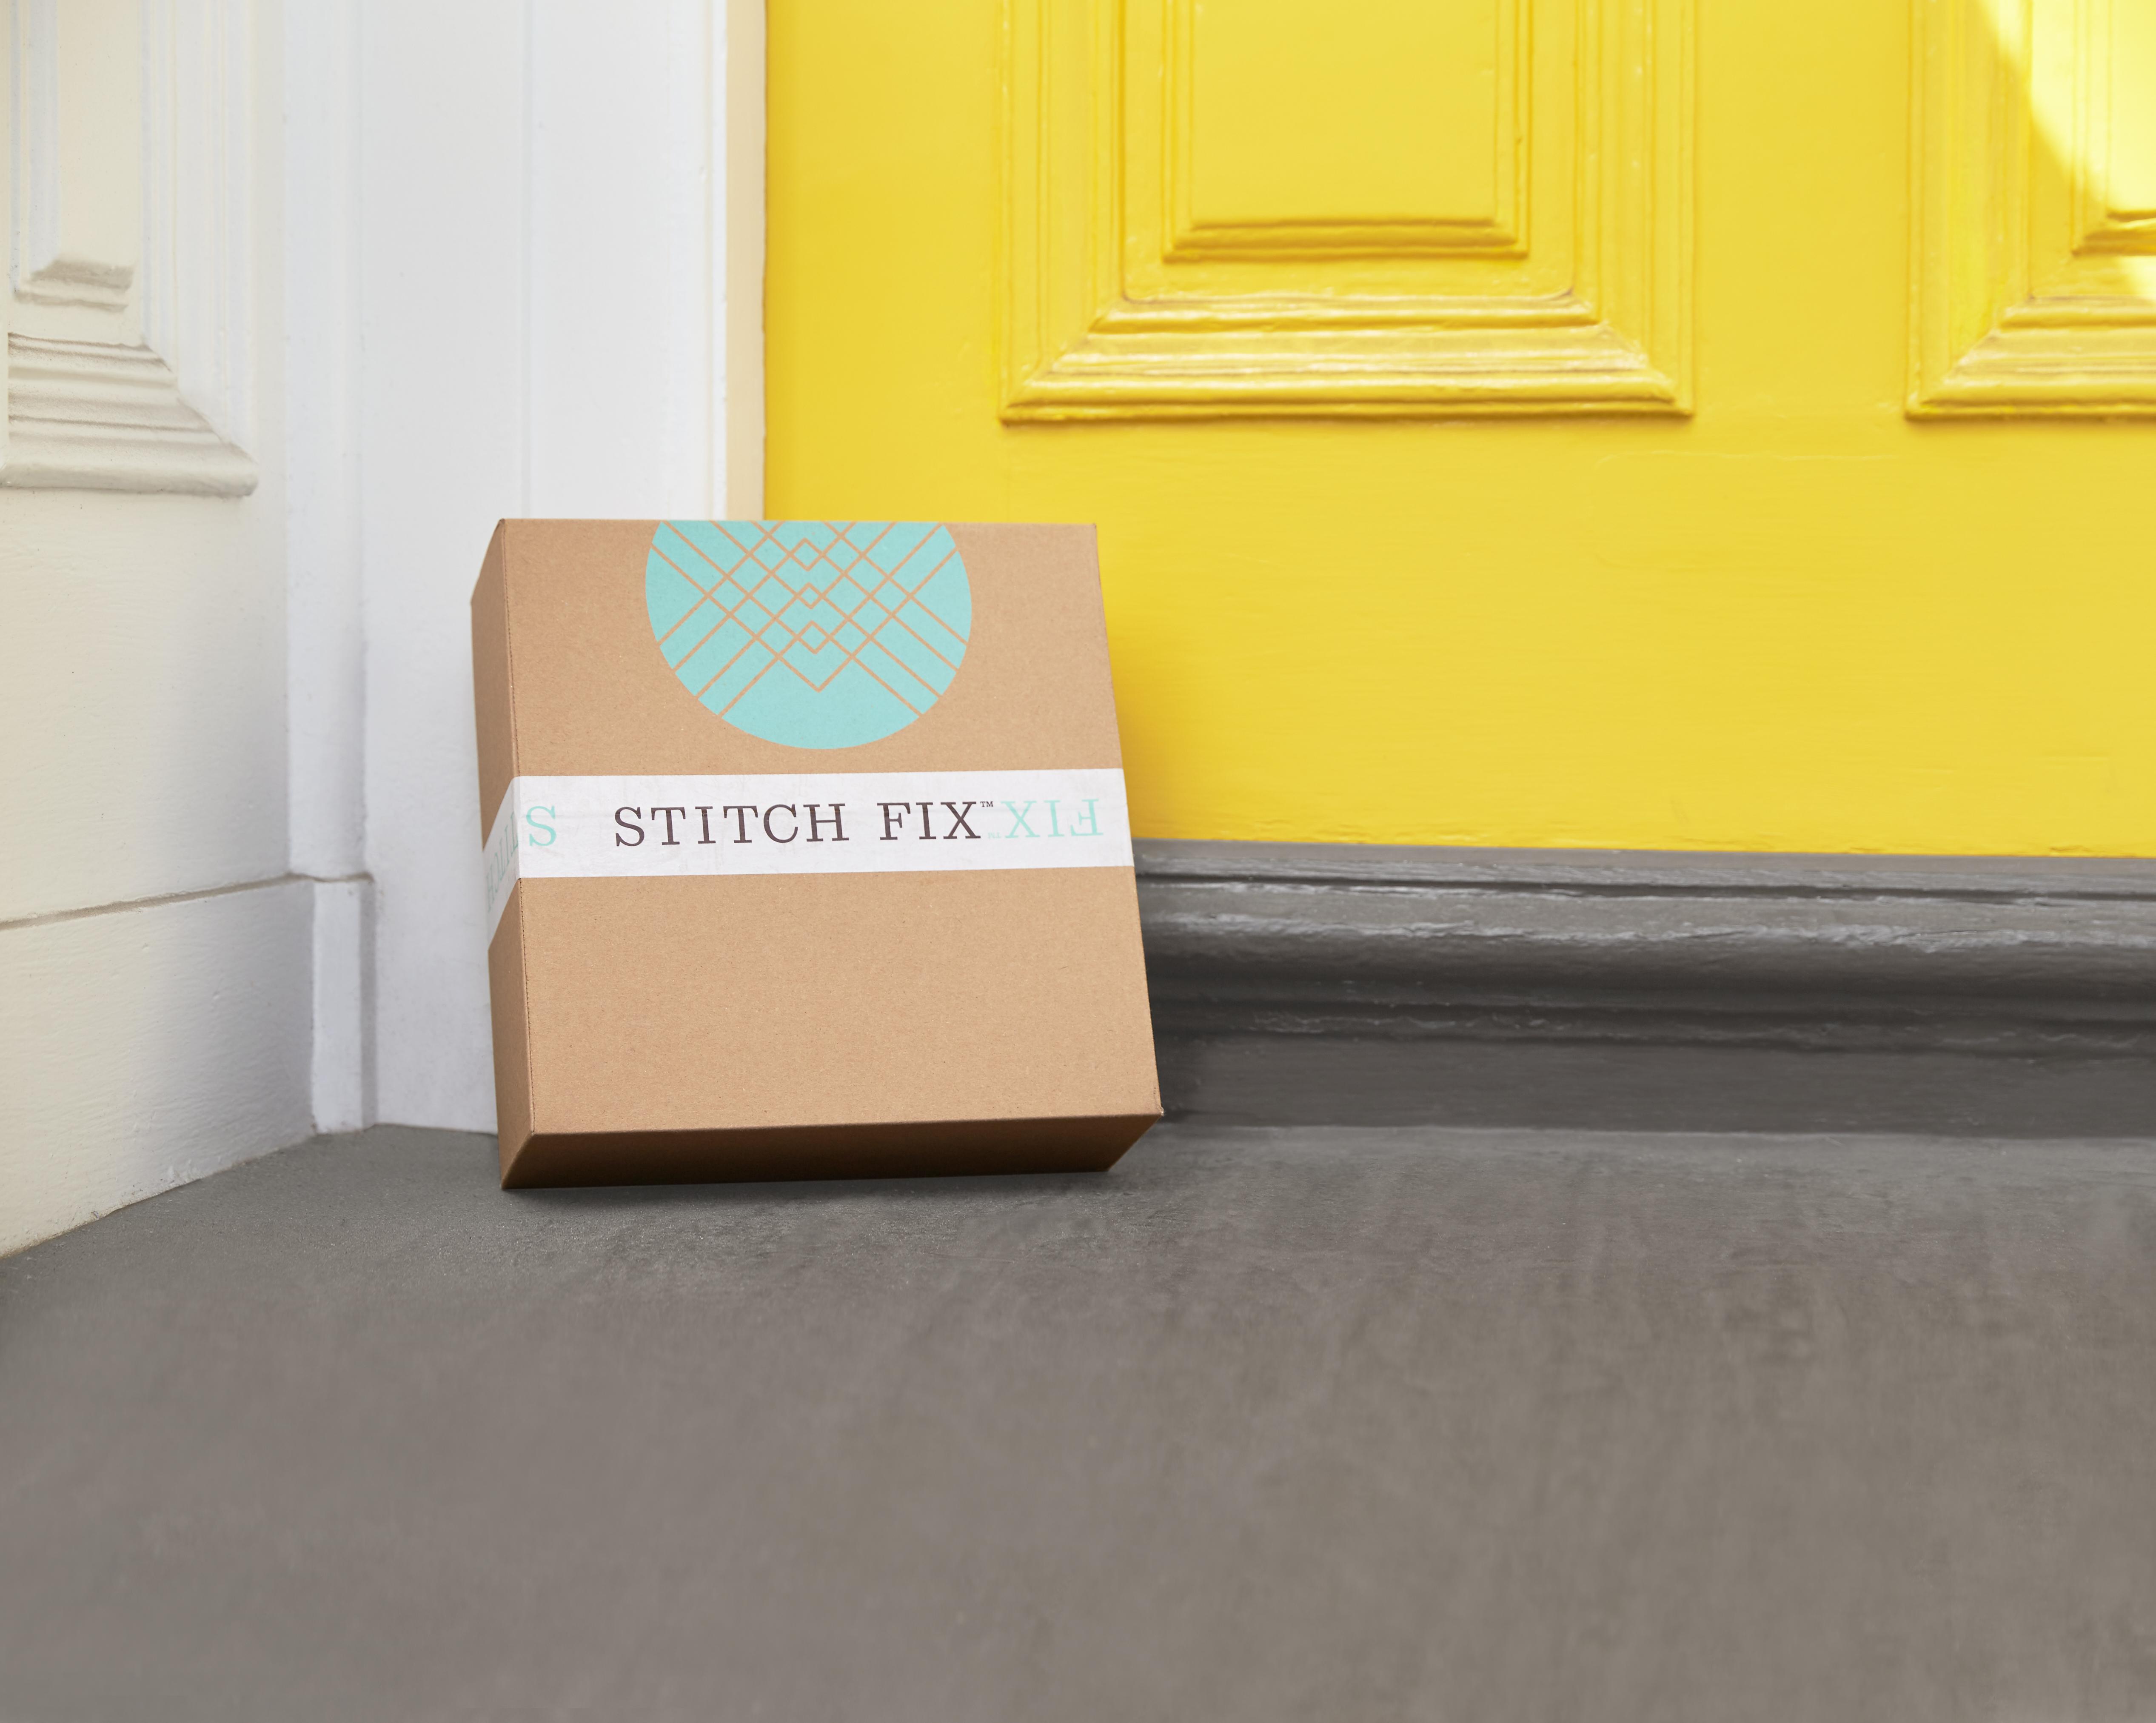 A Stitch Fix box on a doorstep